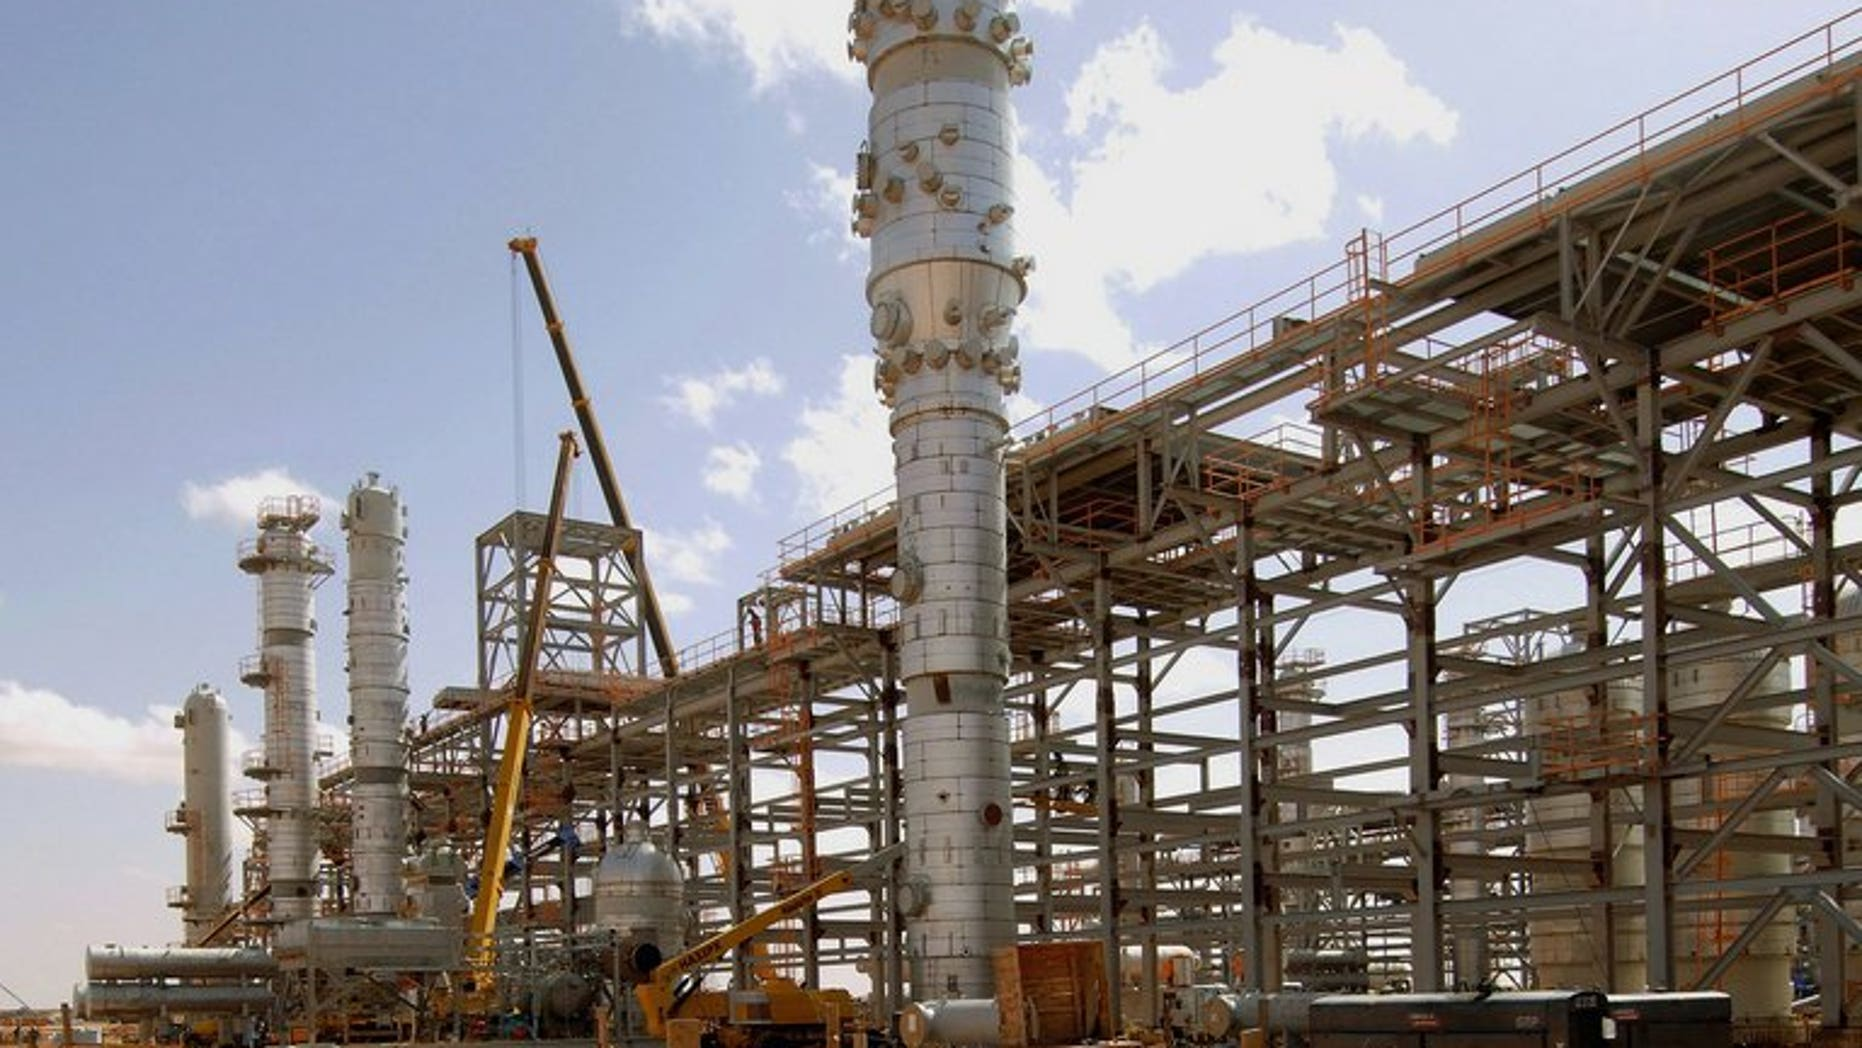 In Amenas gas field in eastern Algeria near the Libyan border.